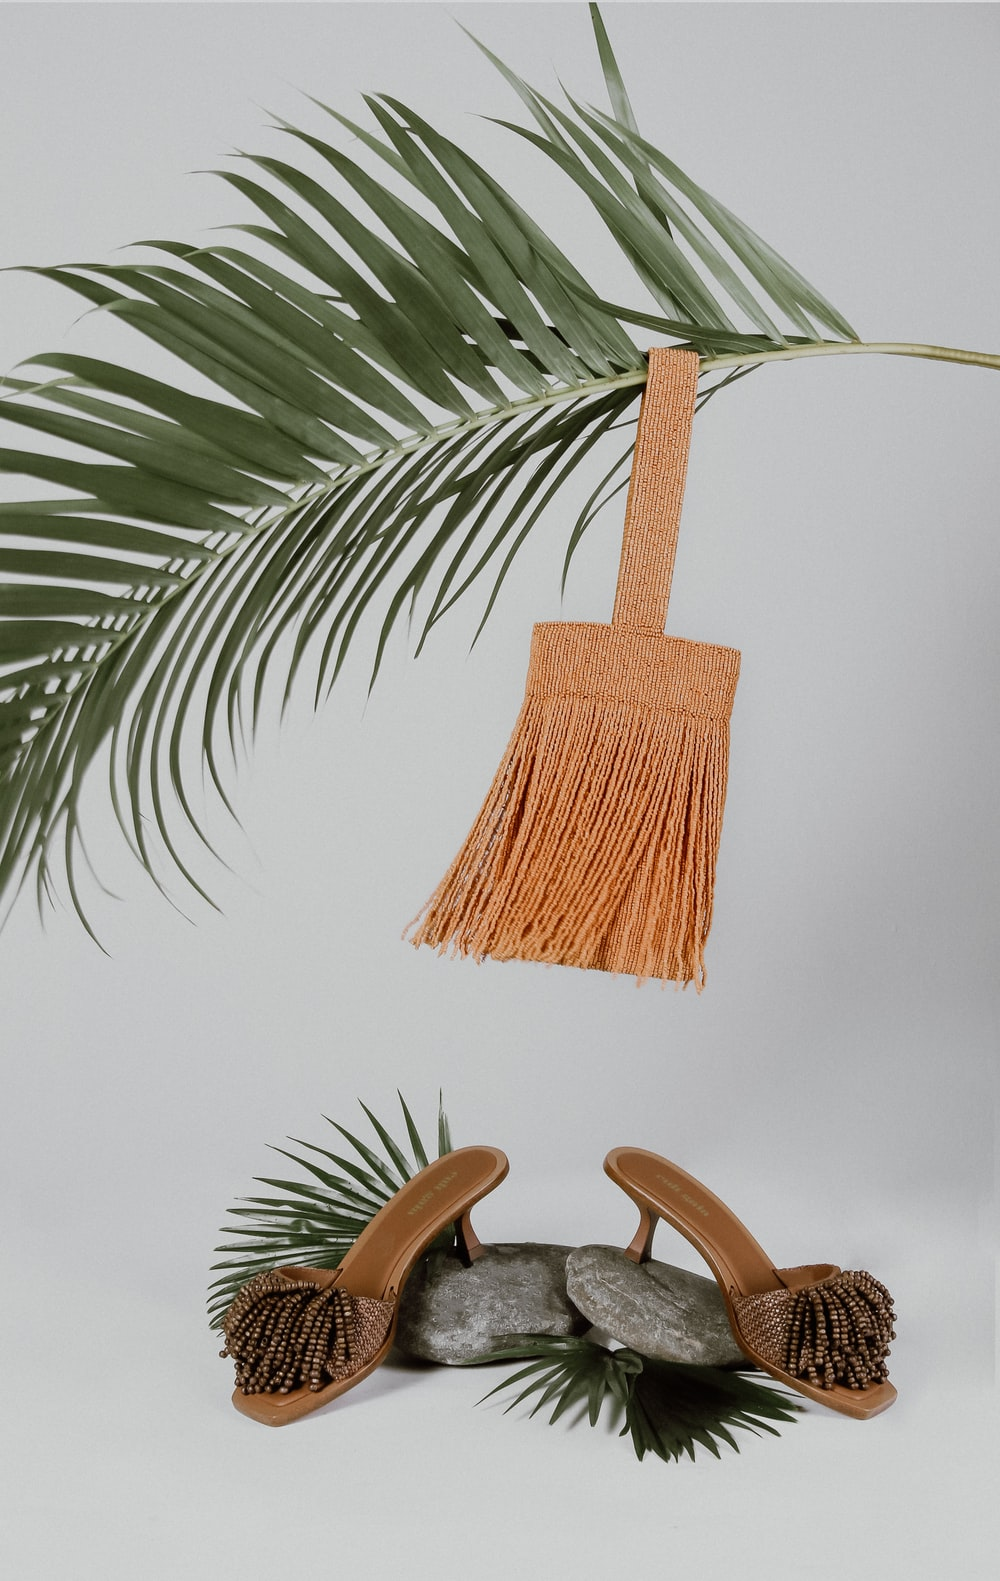 brown wooden chair near green palm tree